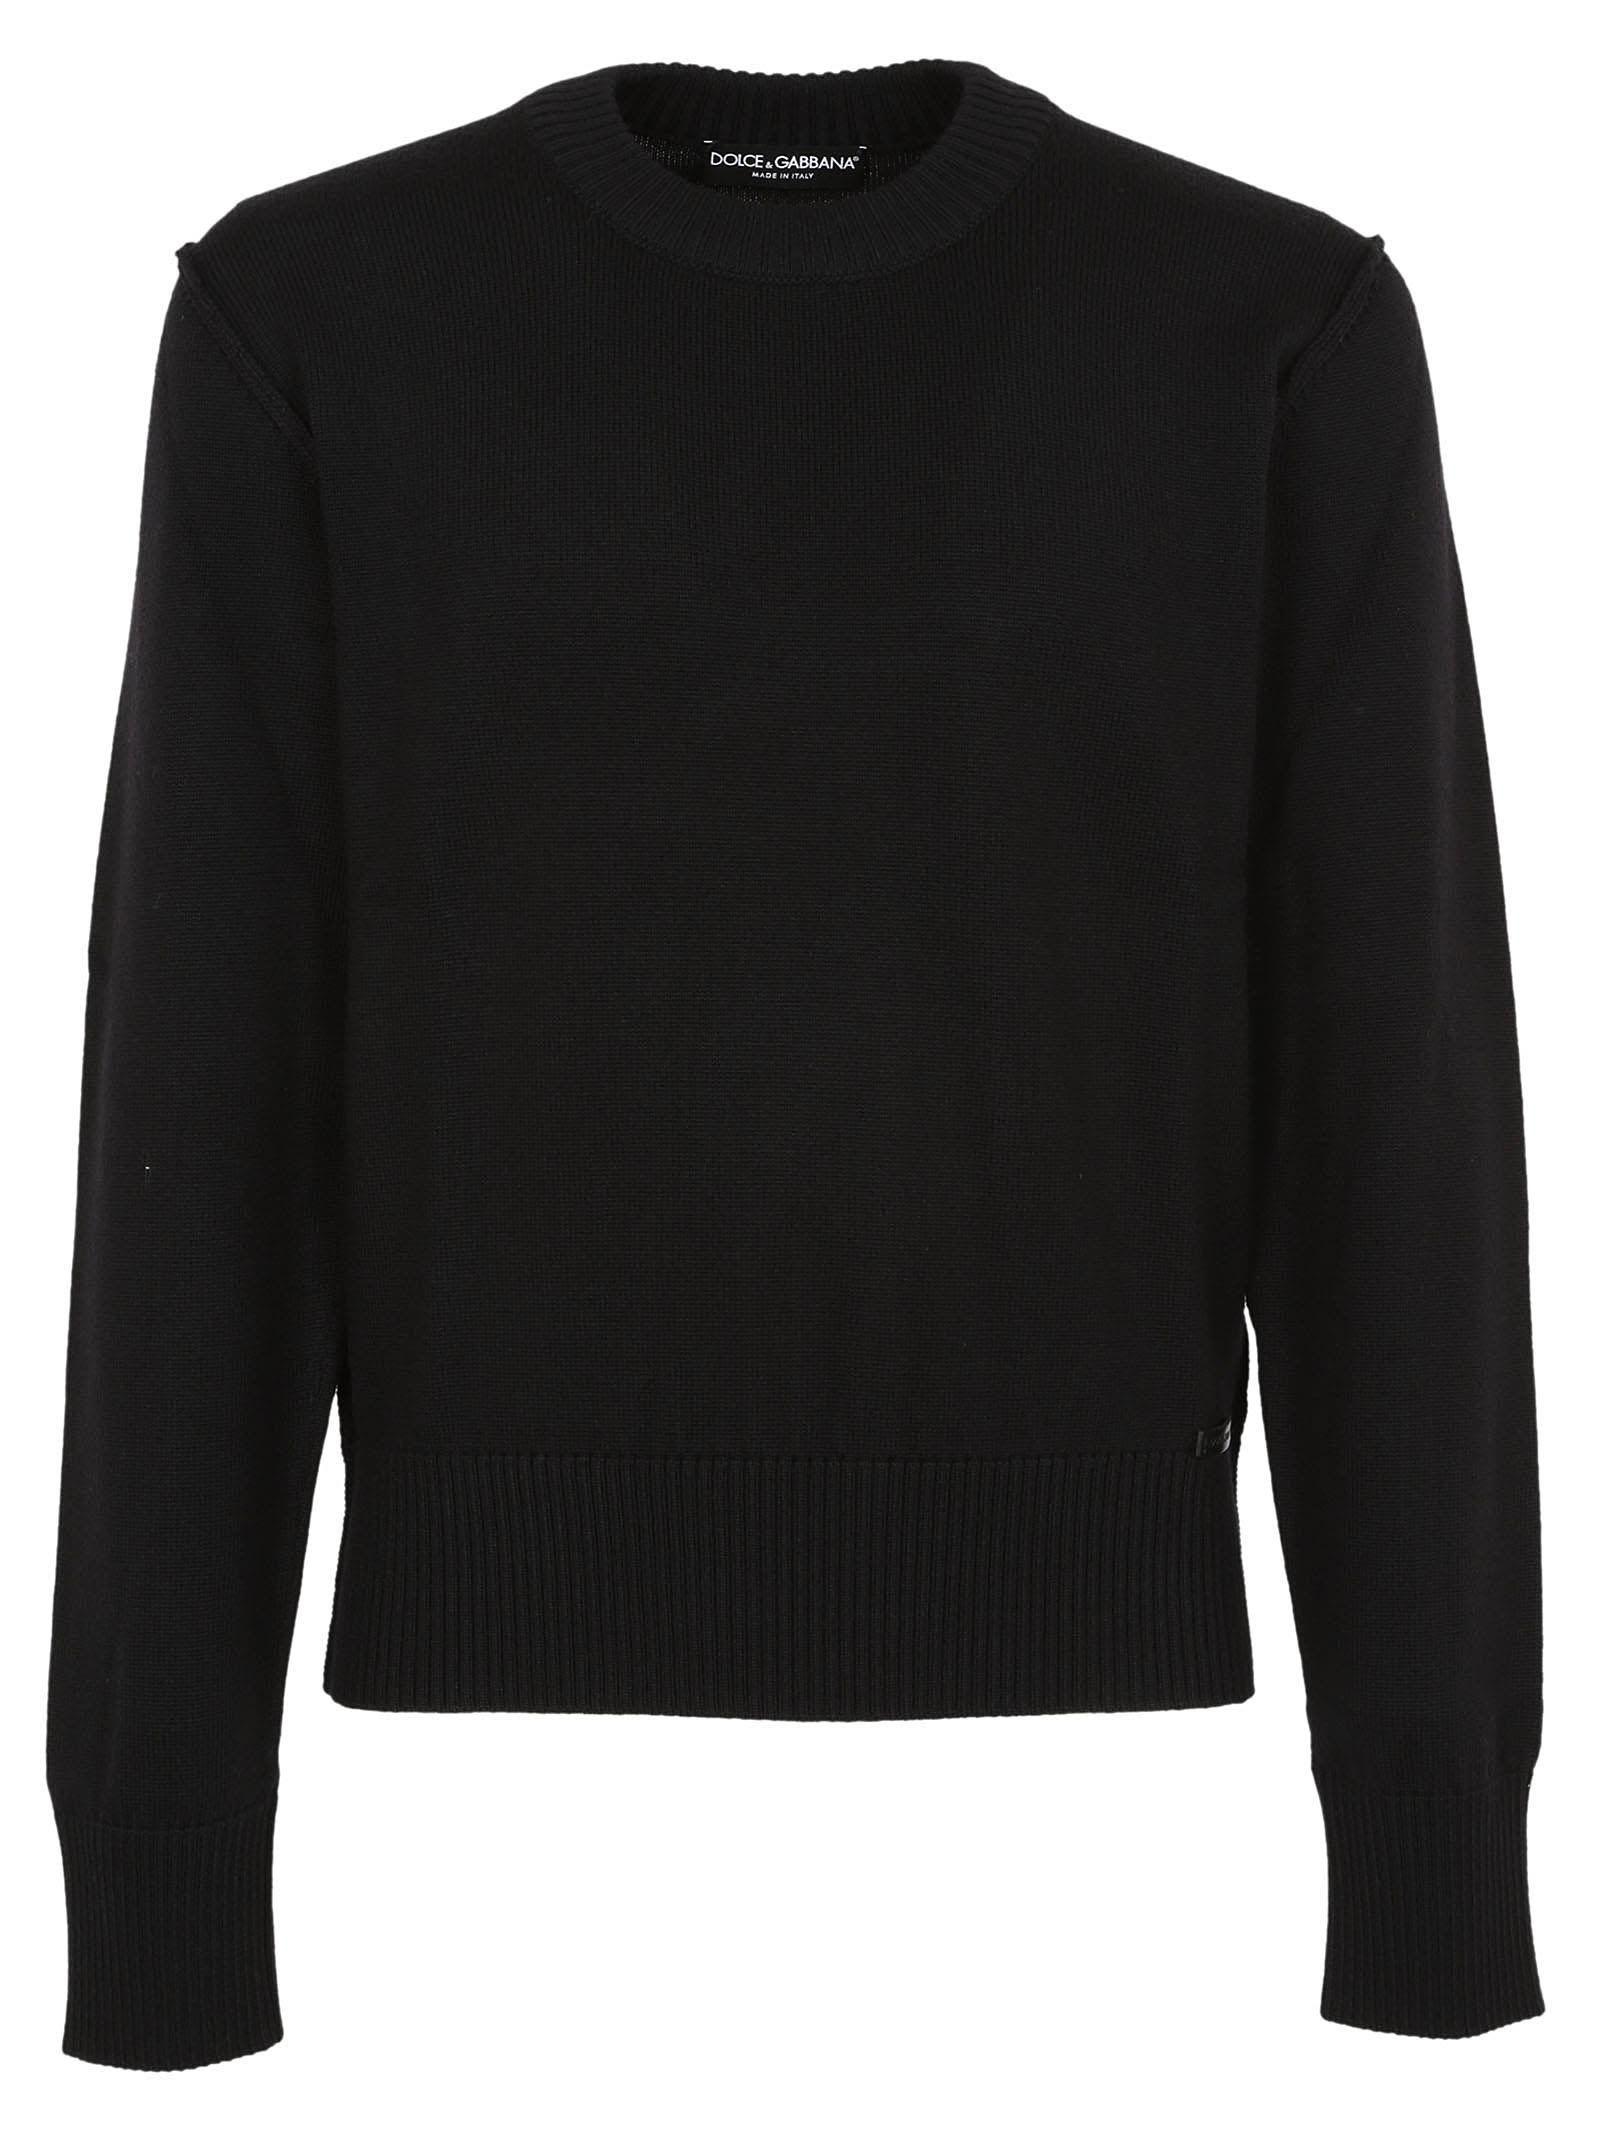 crew neck sweater - Black Dolce & Gabbana Cheap Fake zD5jcZgBR